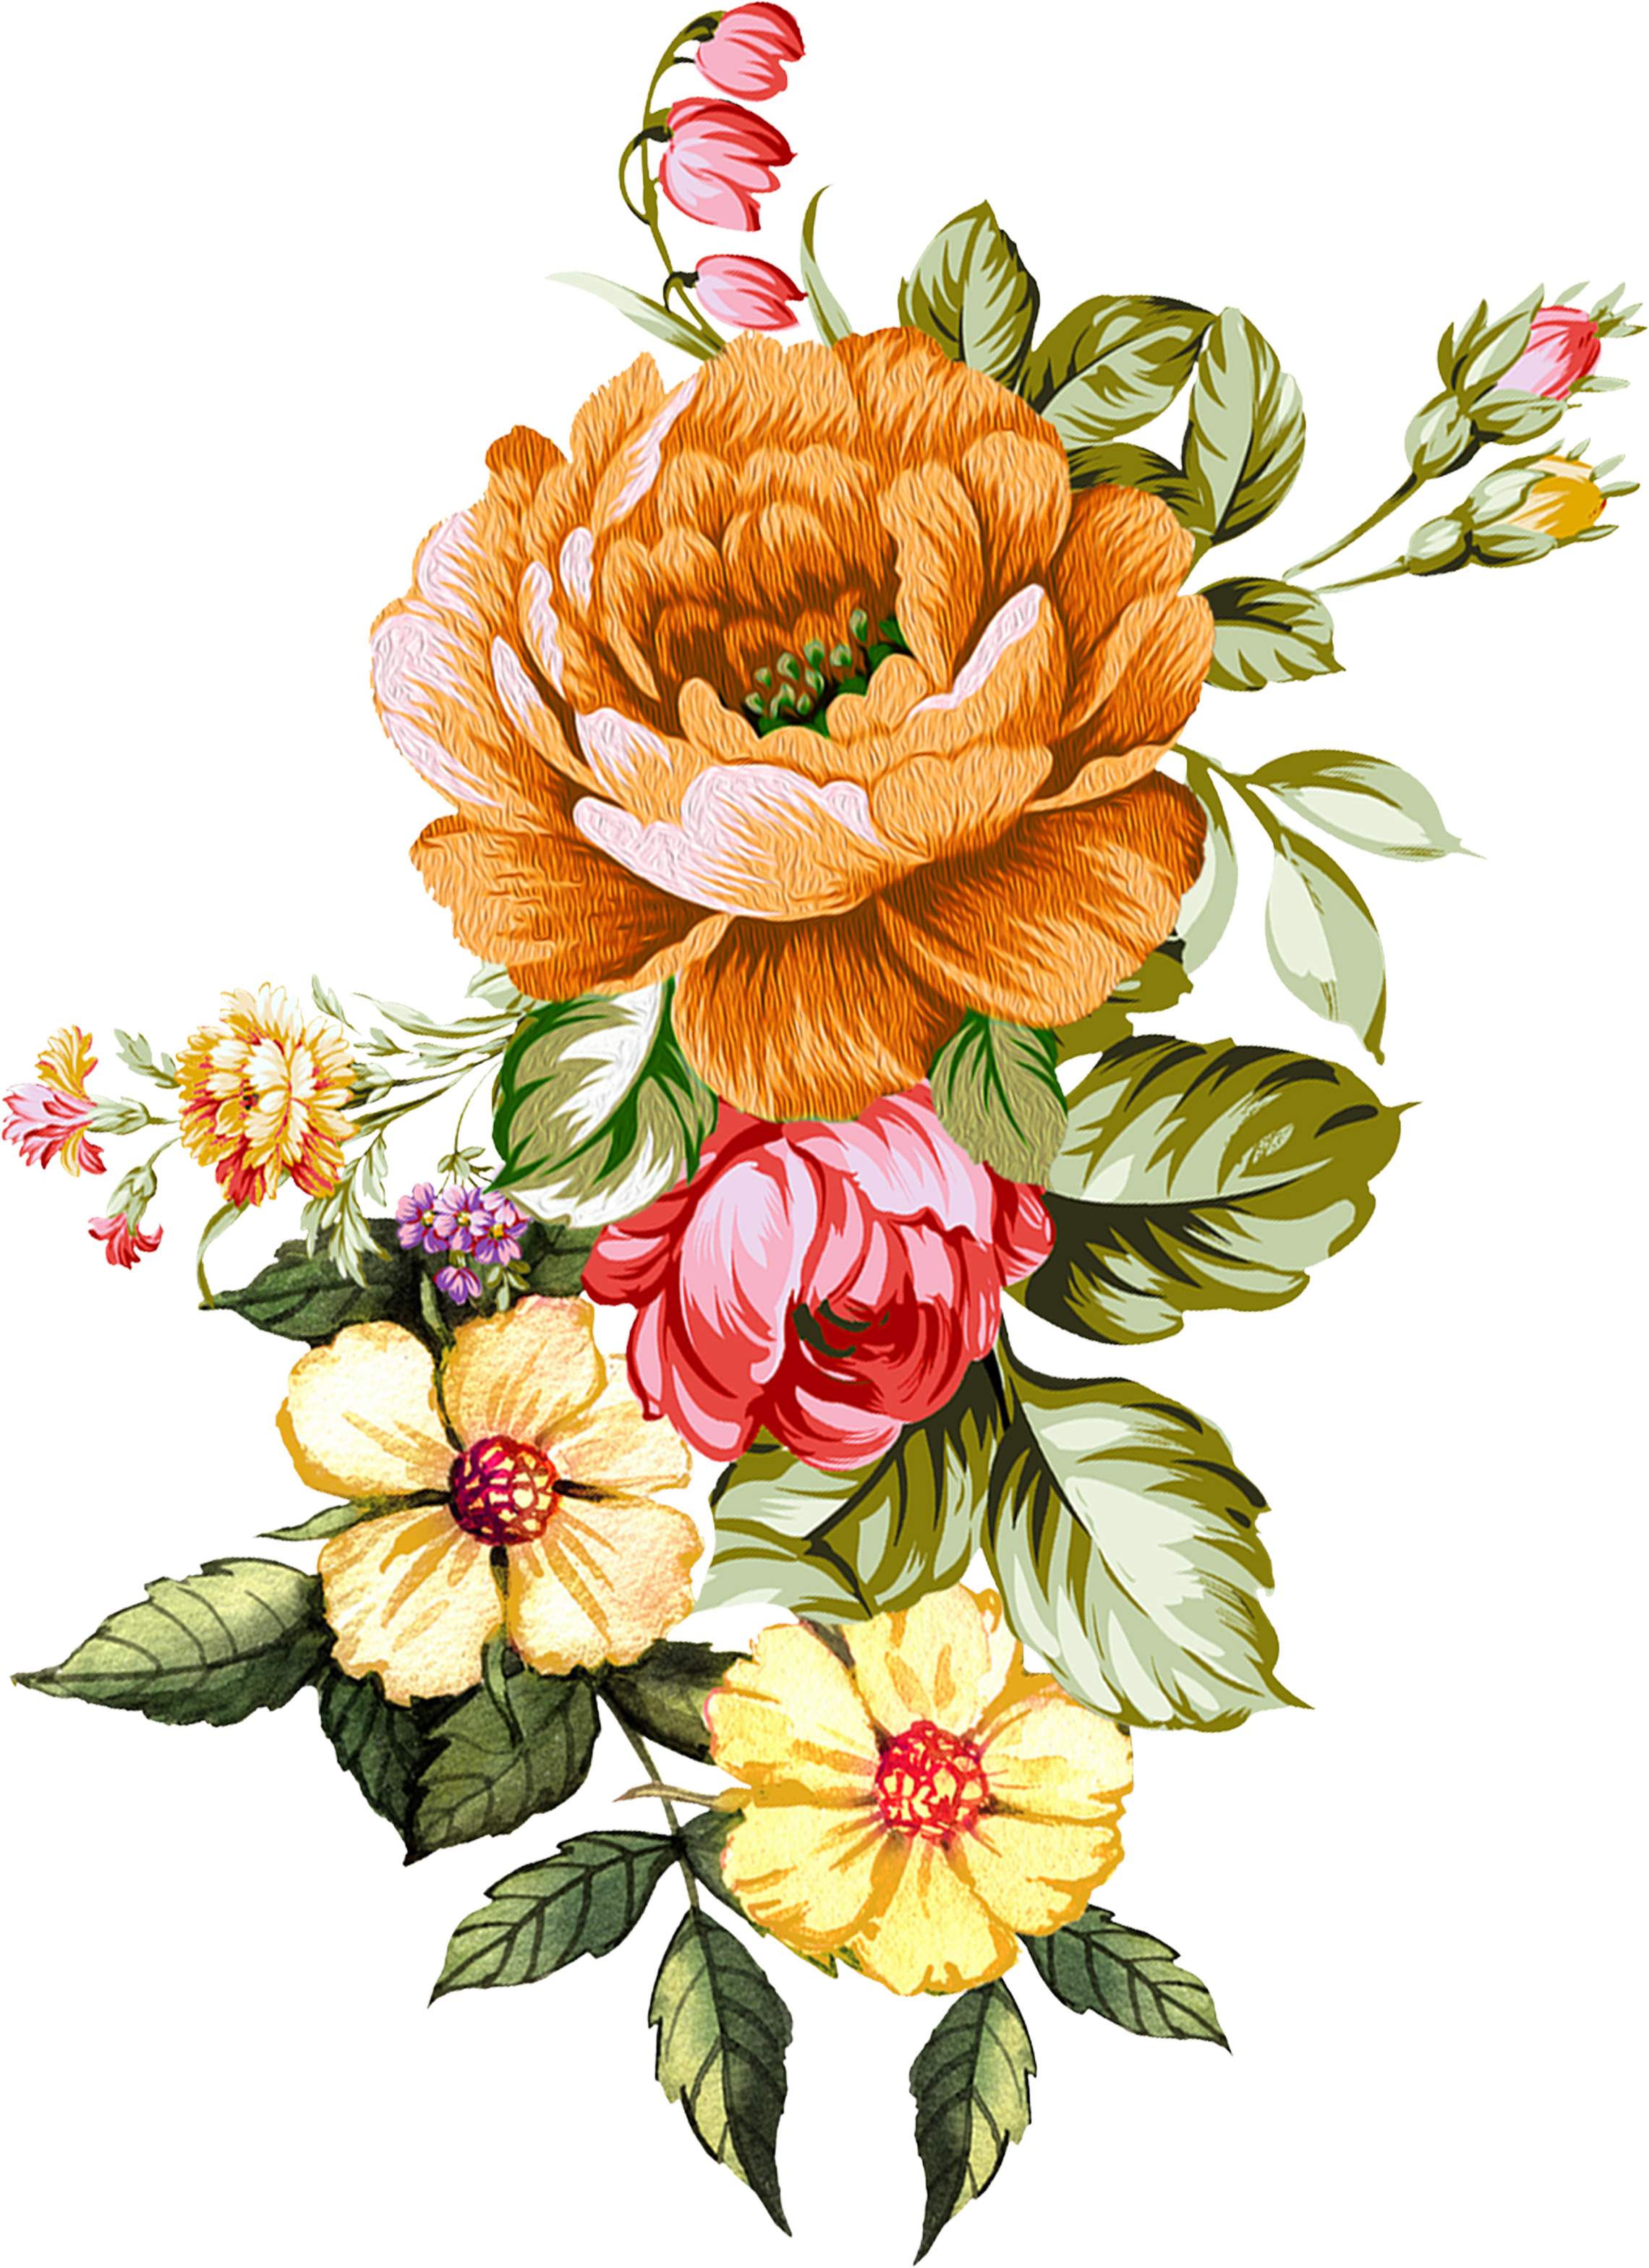 Pin By Umair On Umair Bunch Of Flowers Drawing Digital Flowers Flower Art Painting